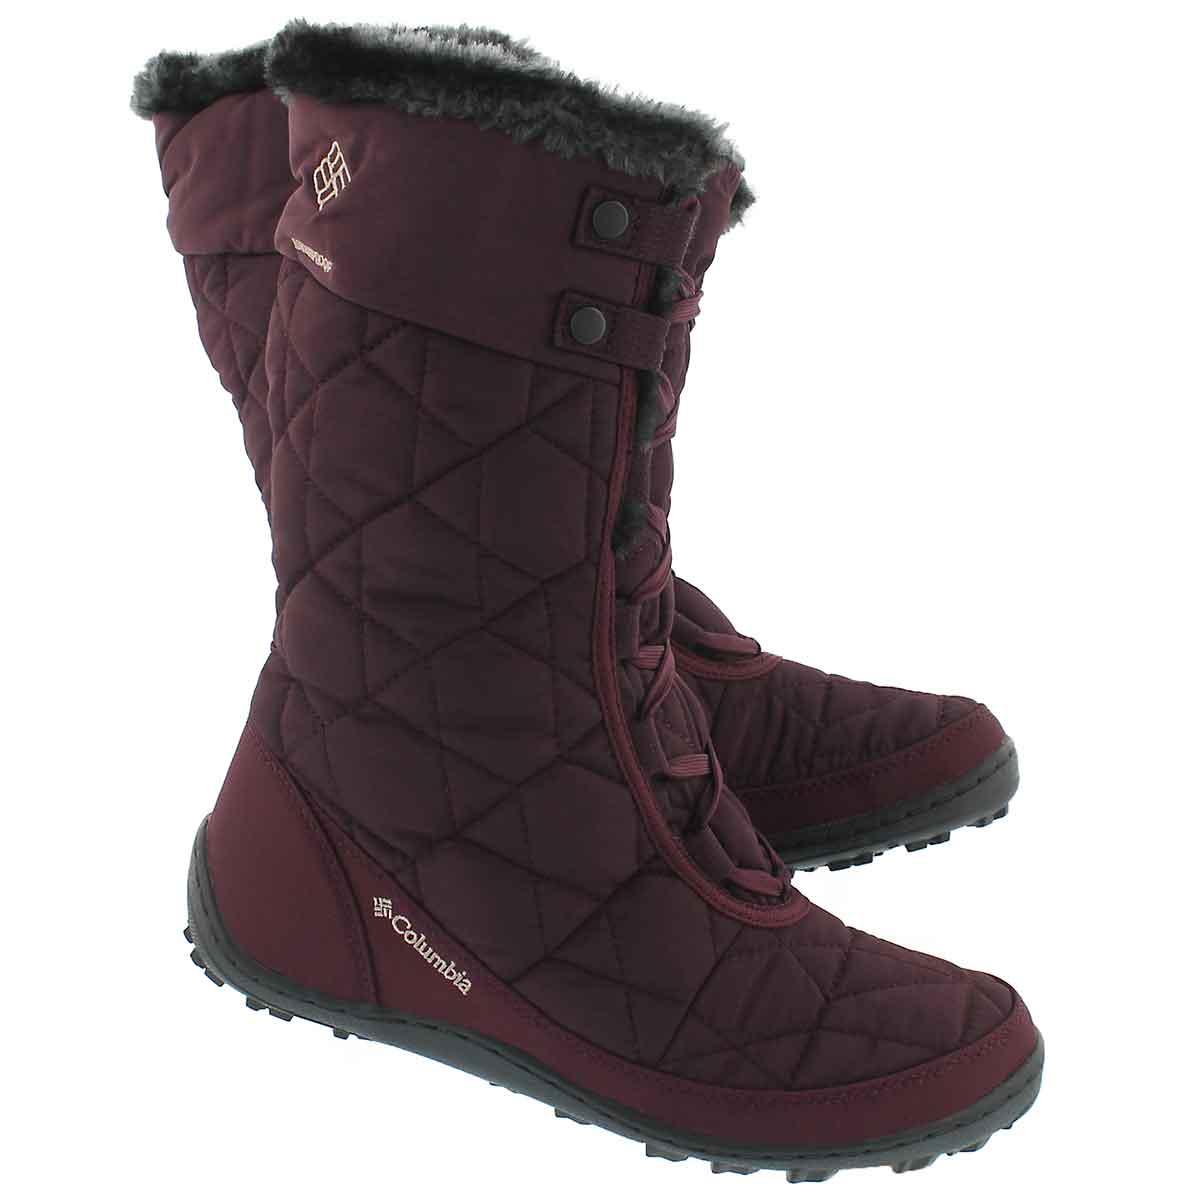 Lds Minx Mid II purple winter boot